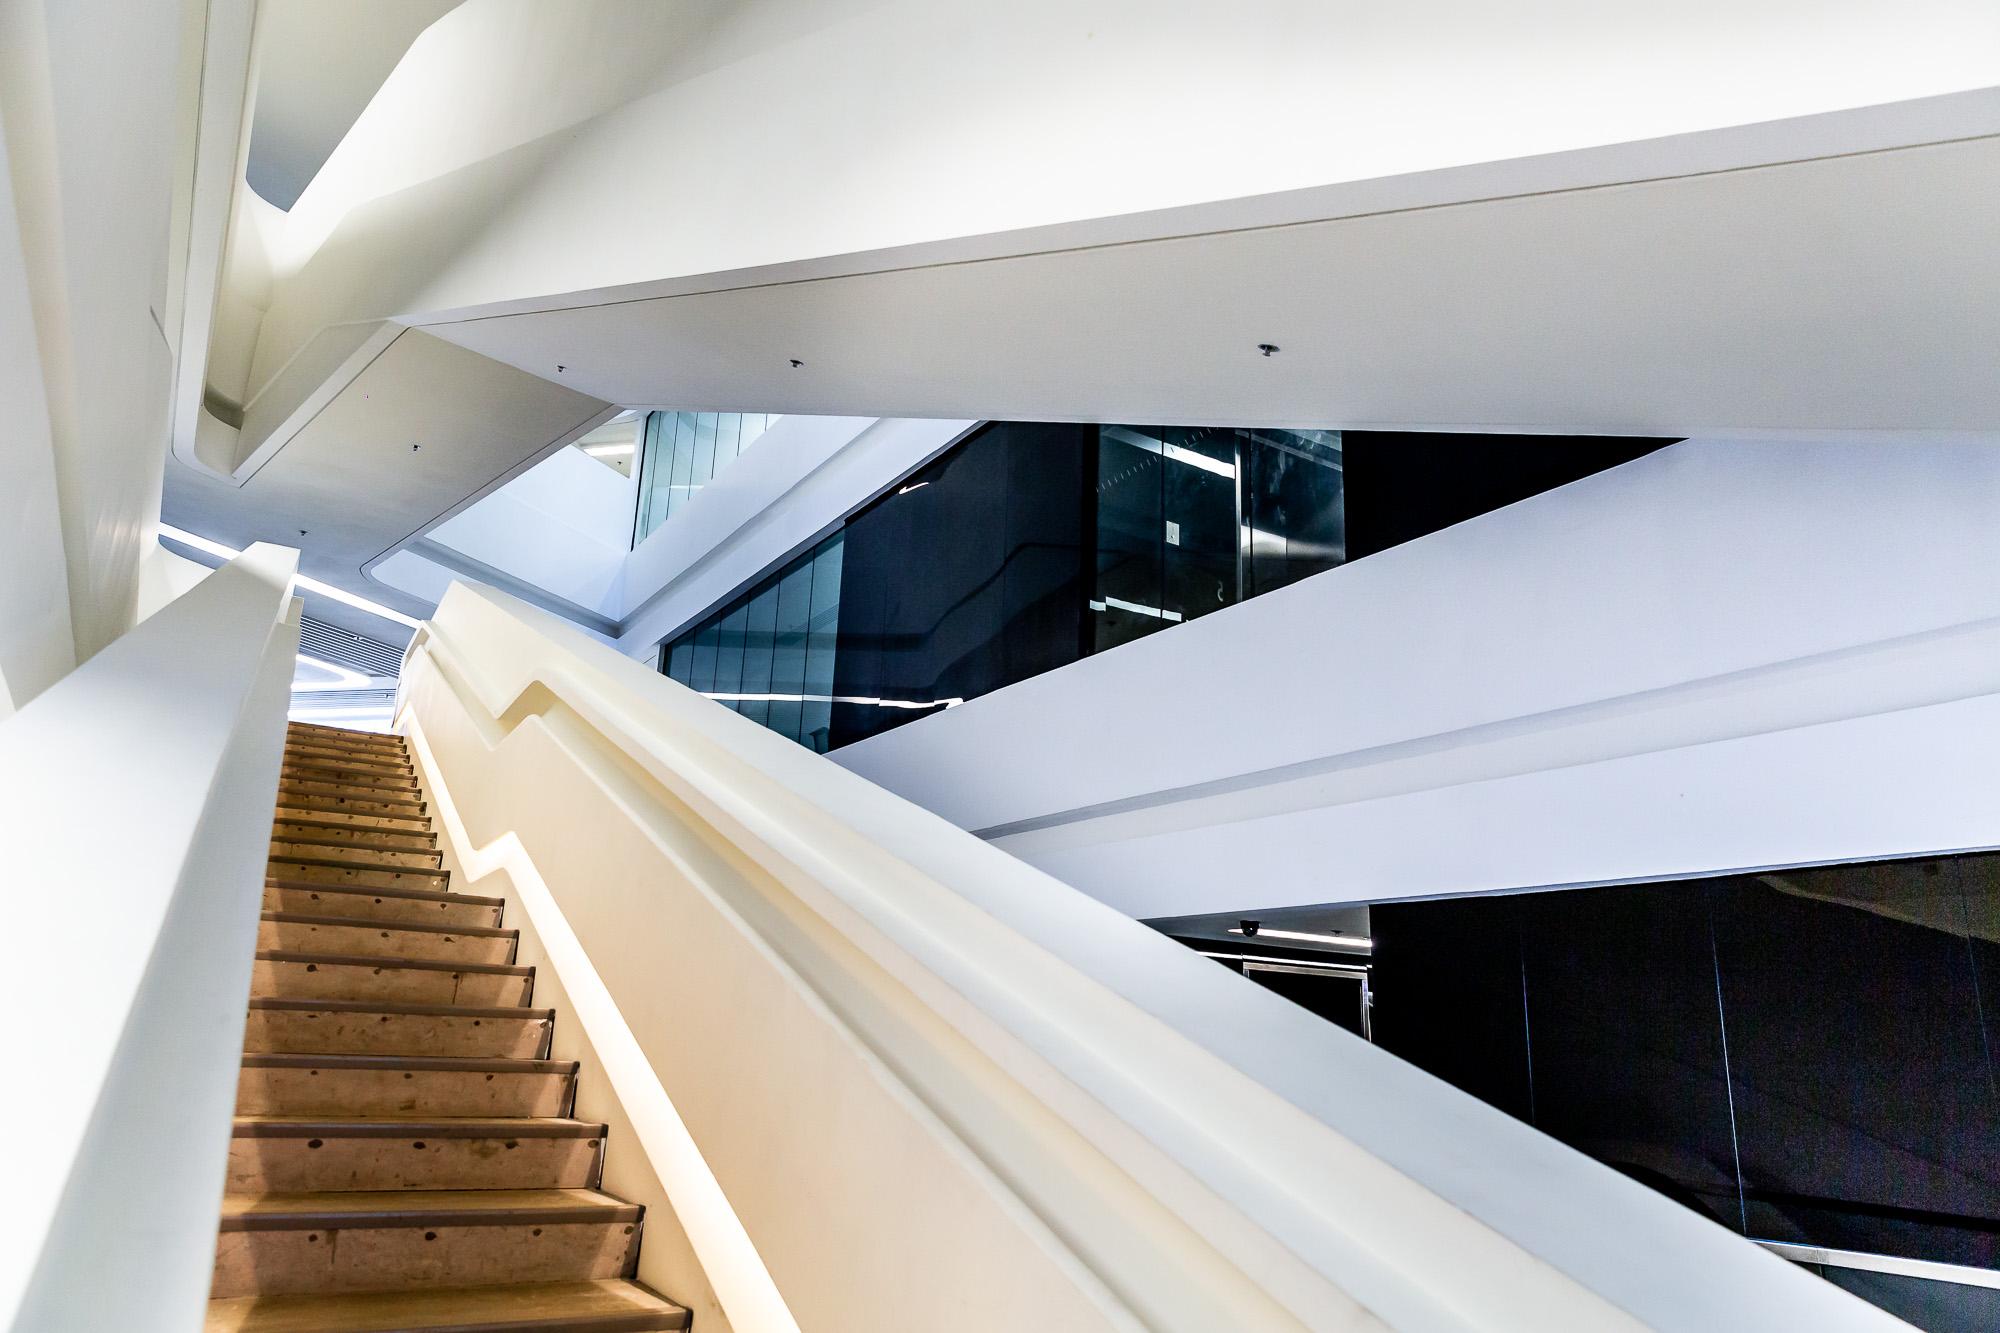 HK Architecture-0405.jpg